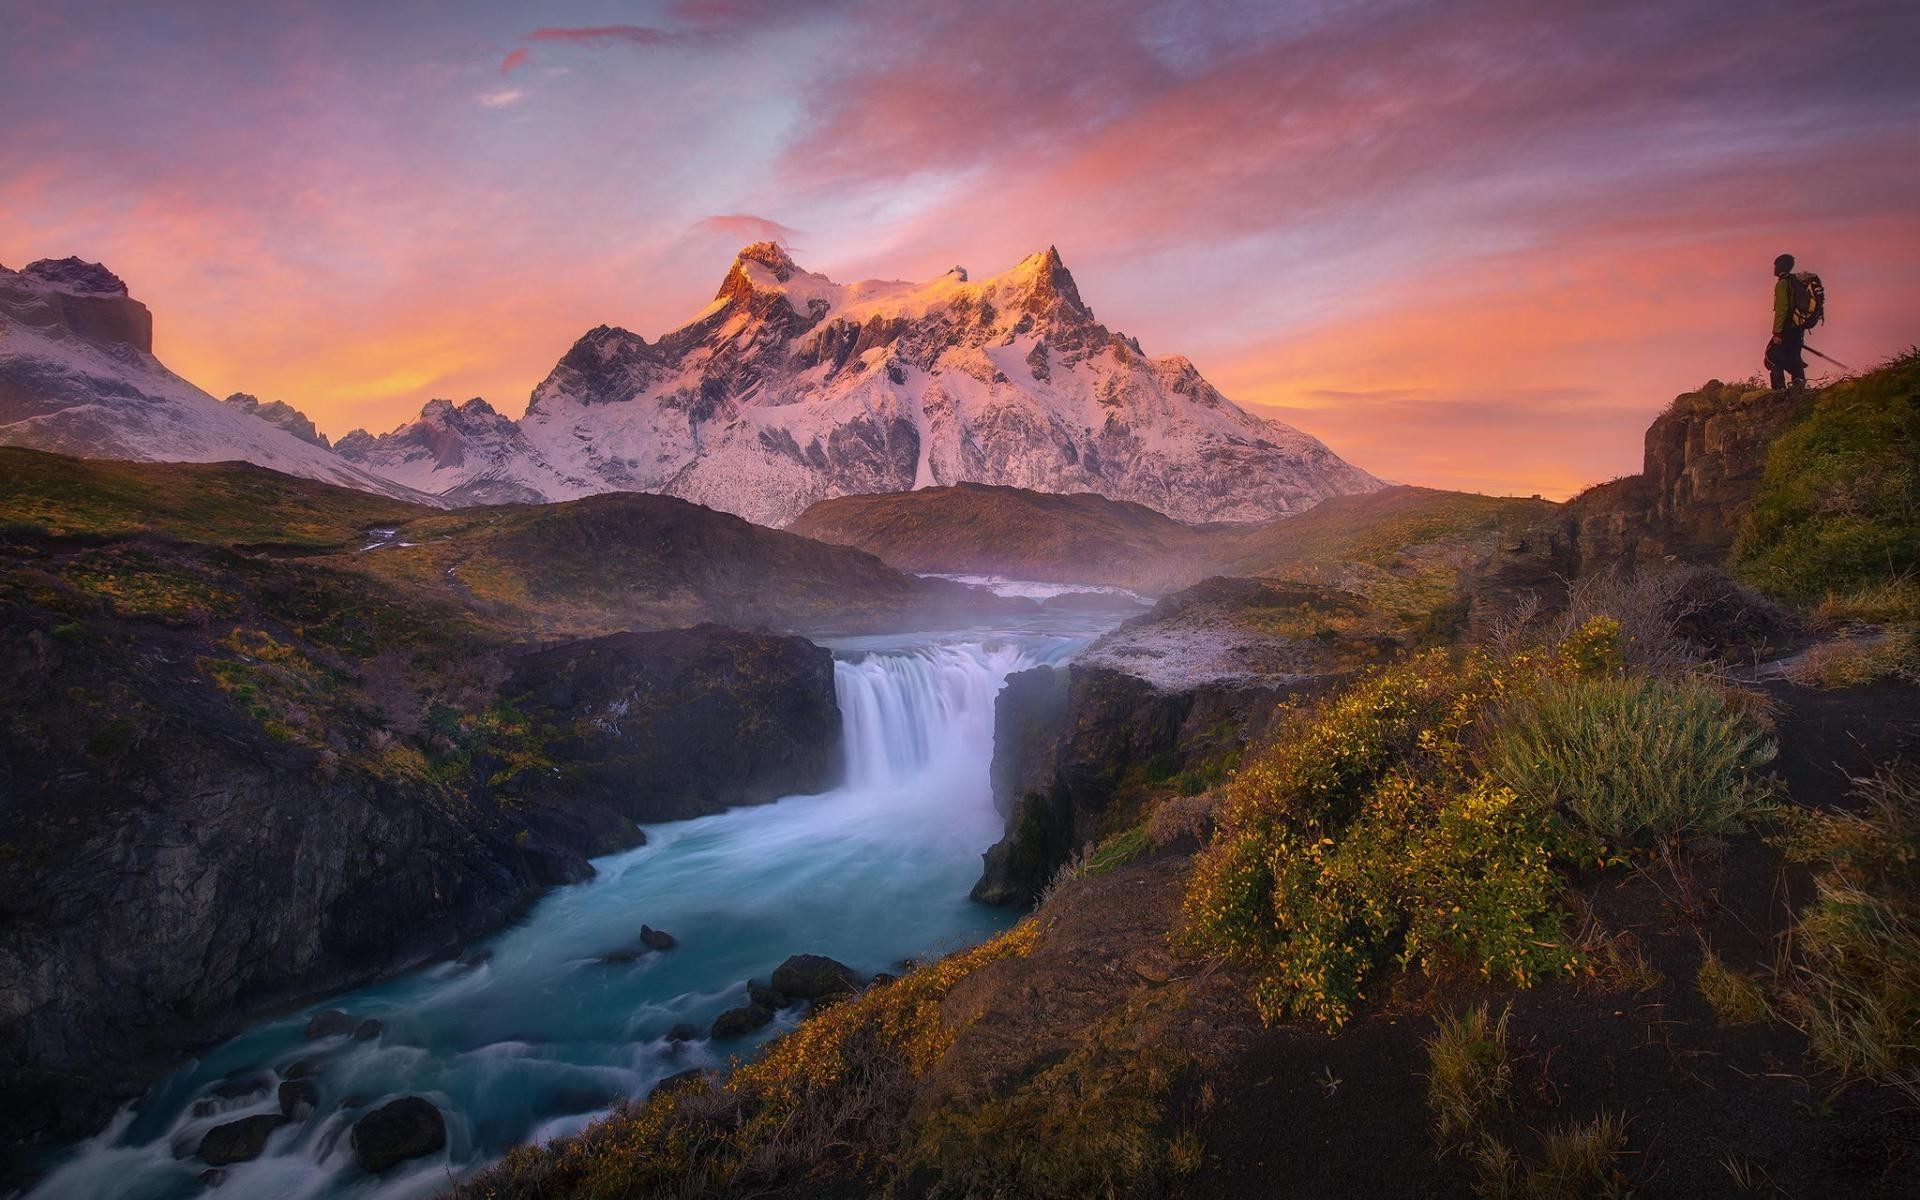 Mountain Waterfall Scenery Wallpaper